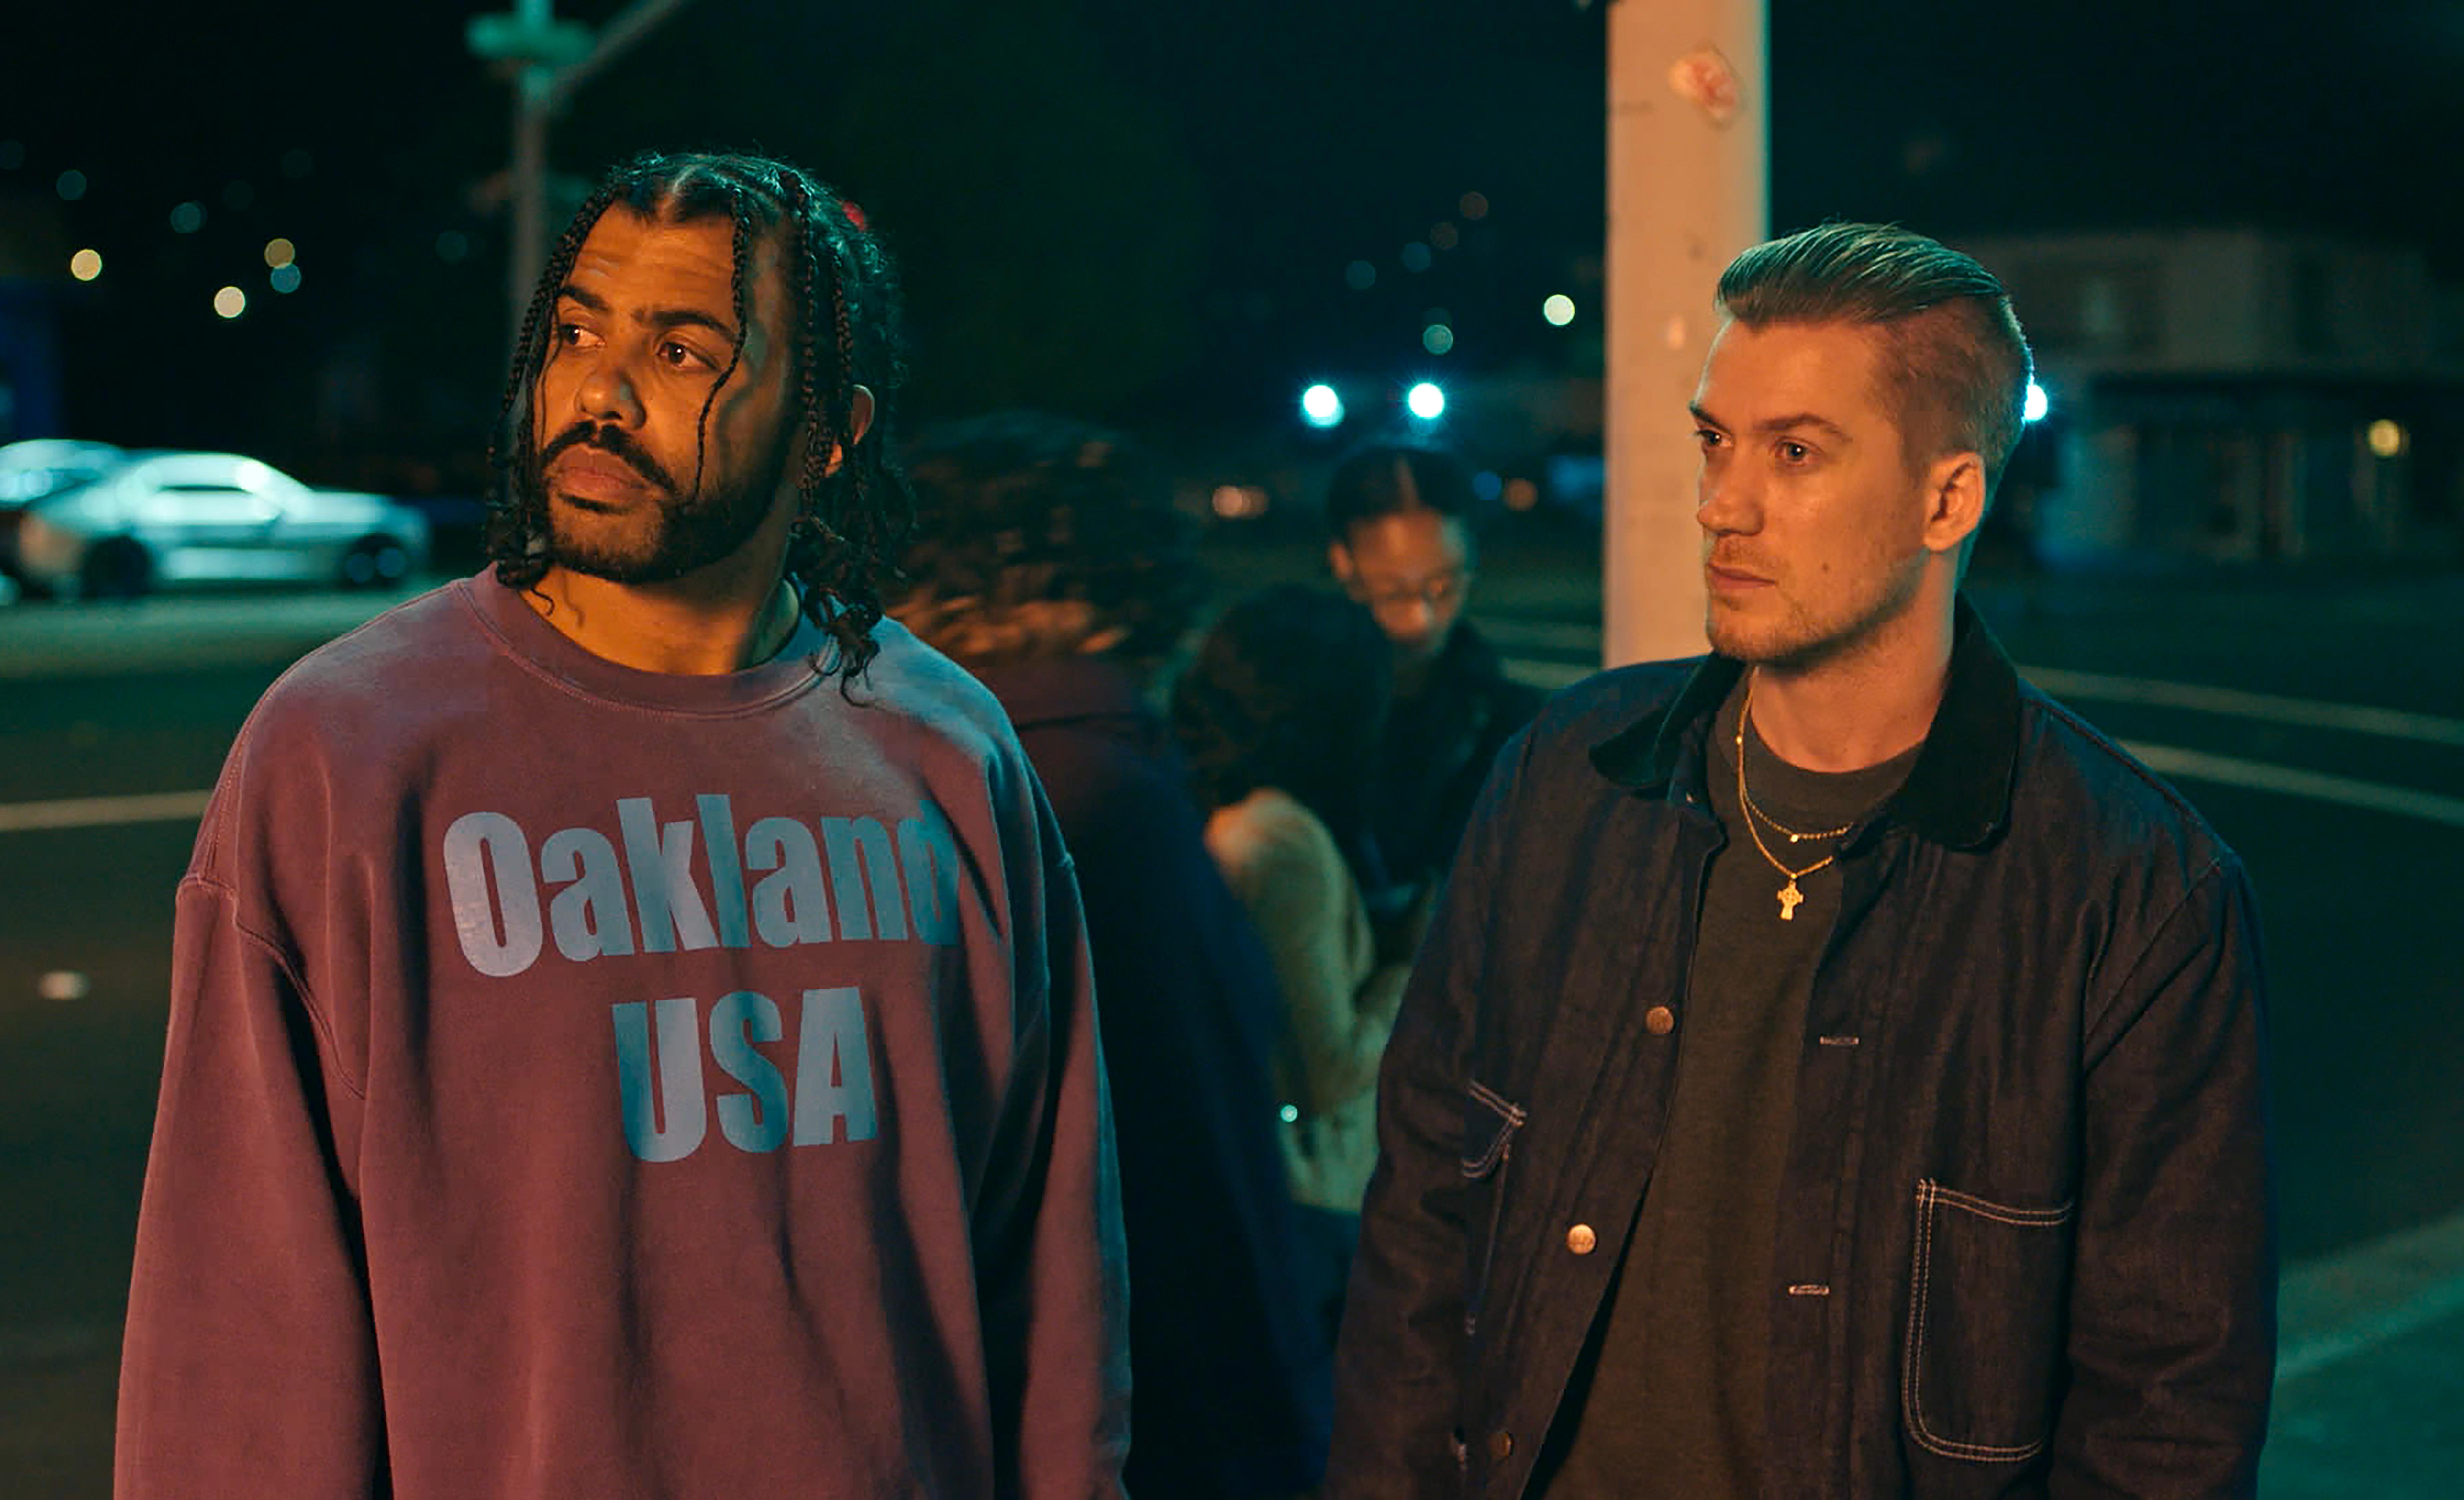 Buddy Comedy 'Blindspotting' Tackles Racism